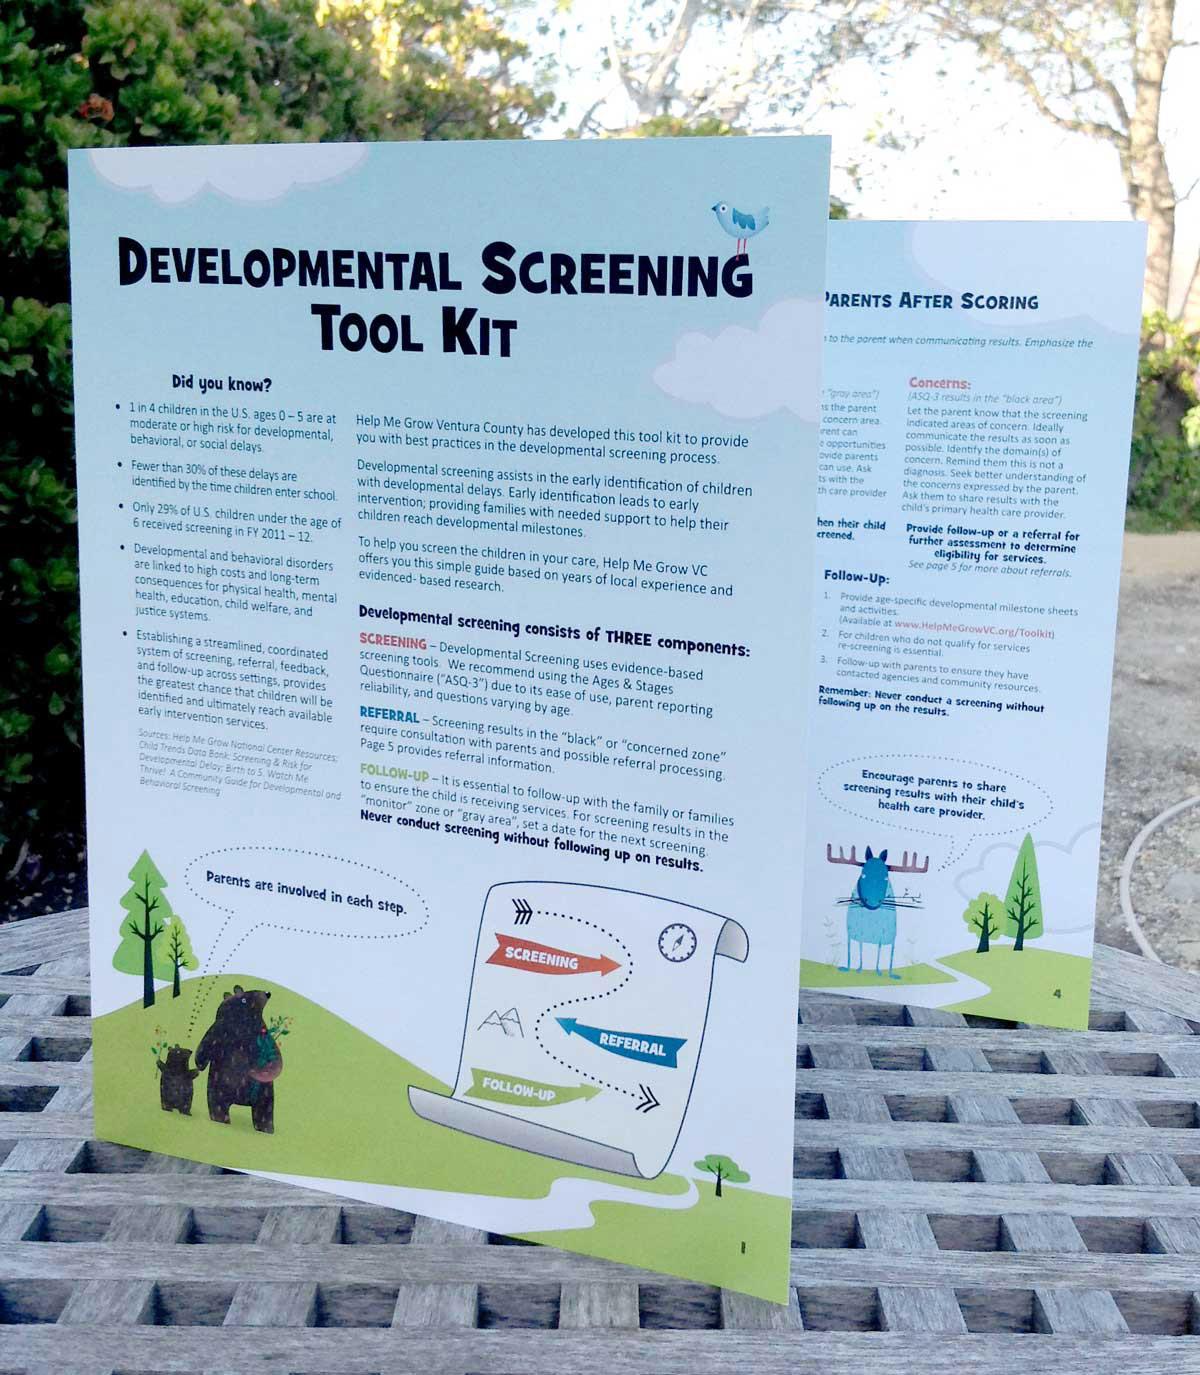 Developmental Screening Toolkit, Help Me Grow Ventura County